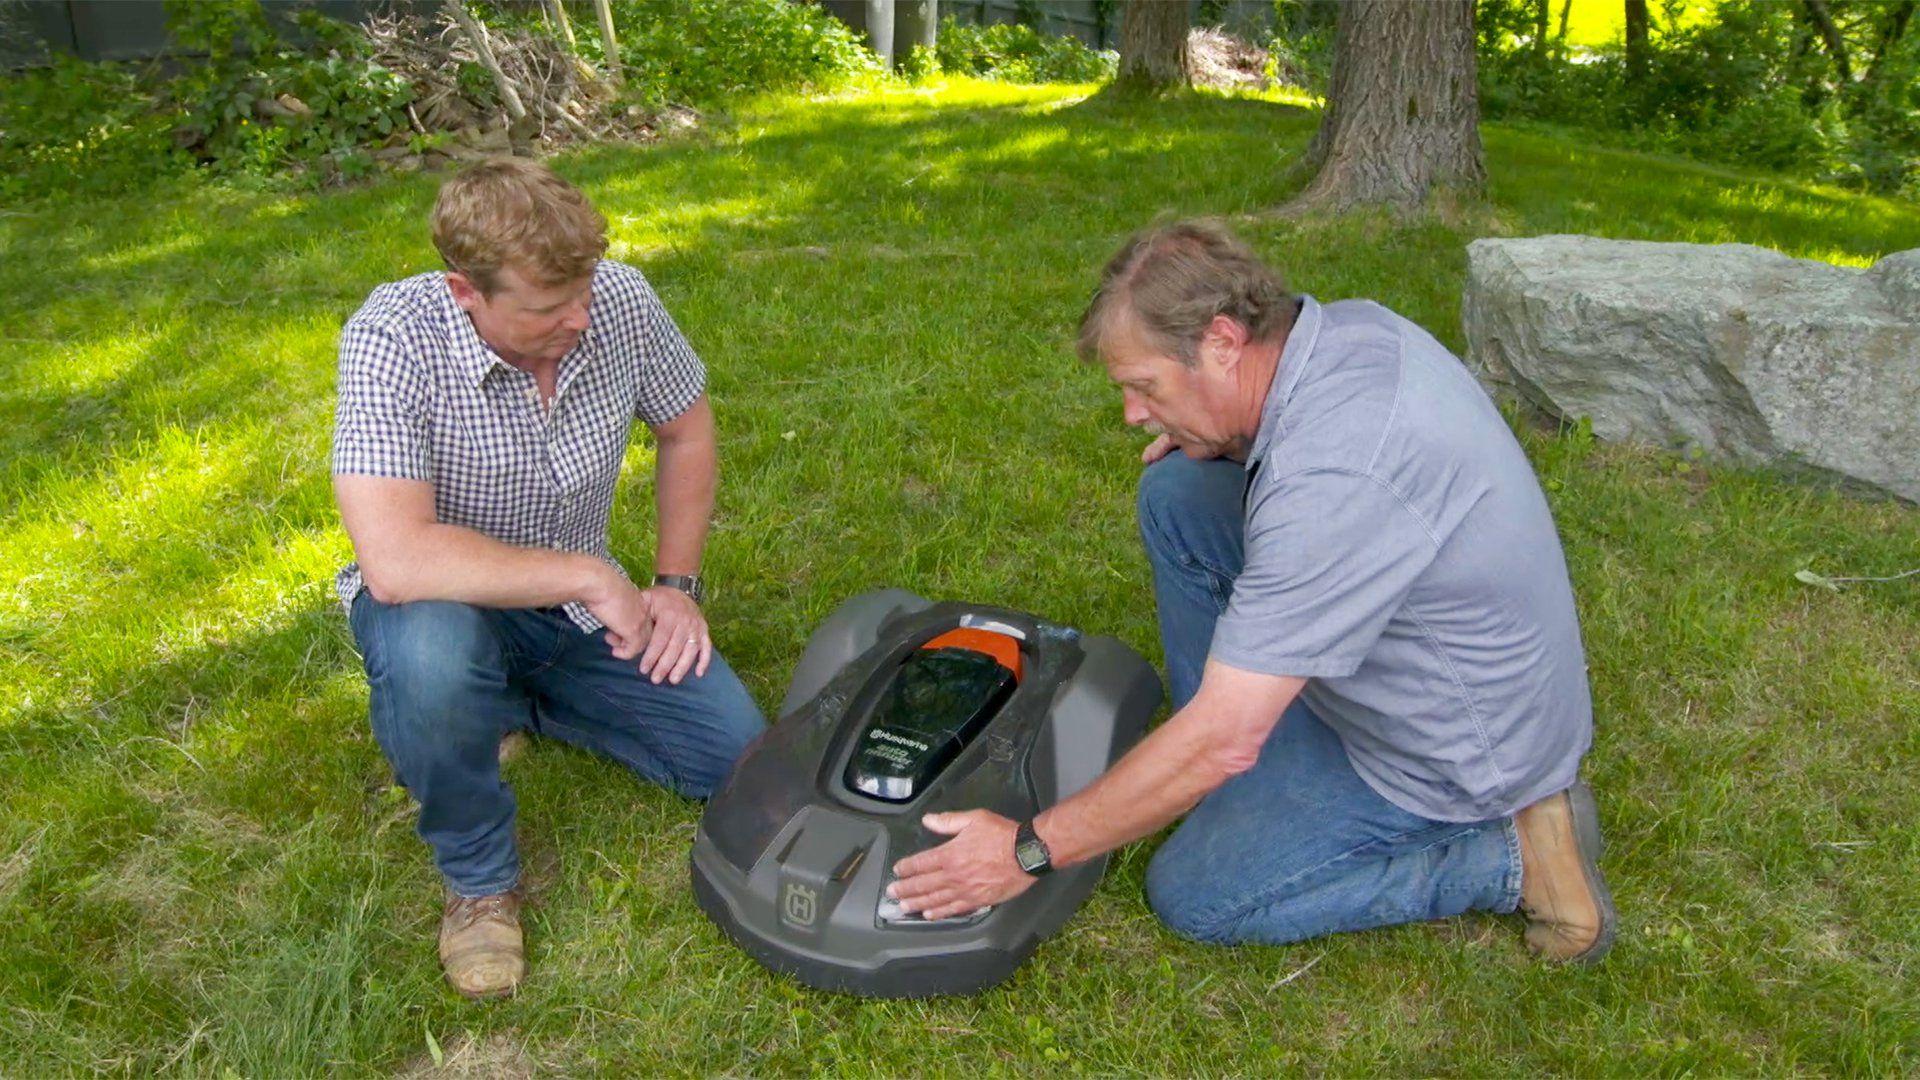 How to #Install a #Robotic #Lawnmower  #yesplease #handyman #handymatters #mowingsucks #gotgrass #lifehacks